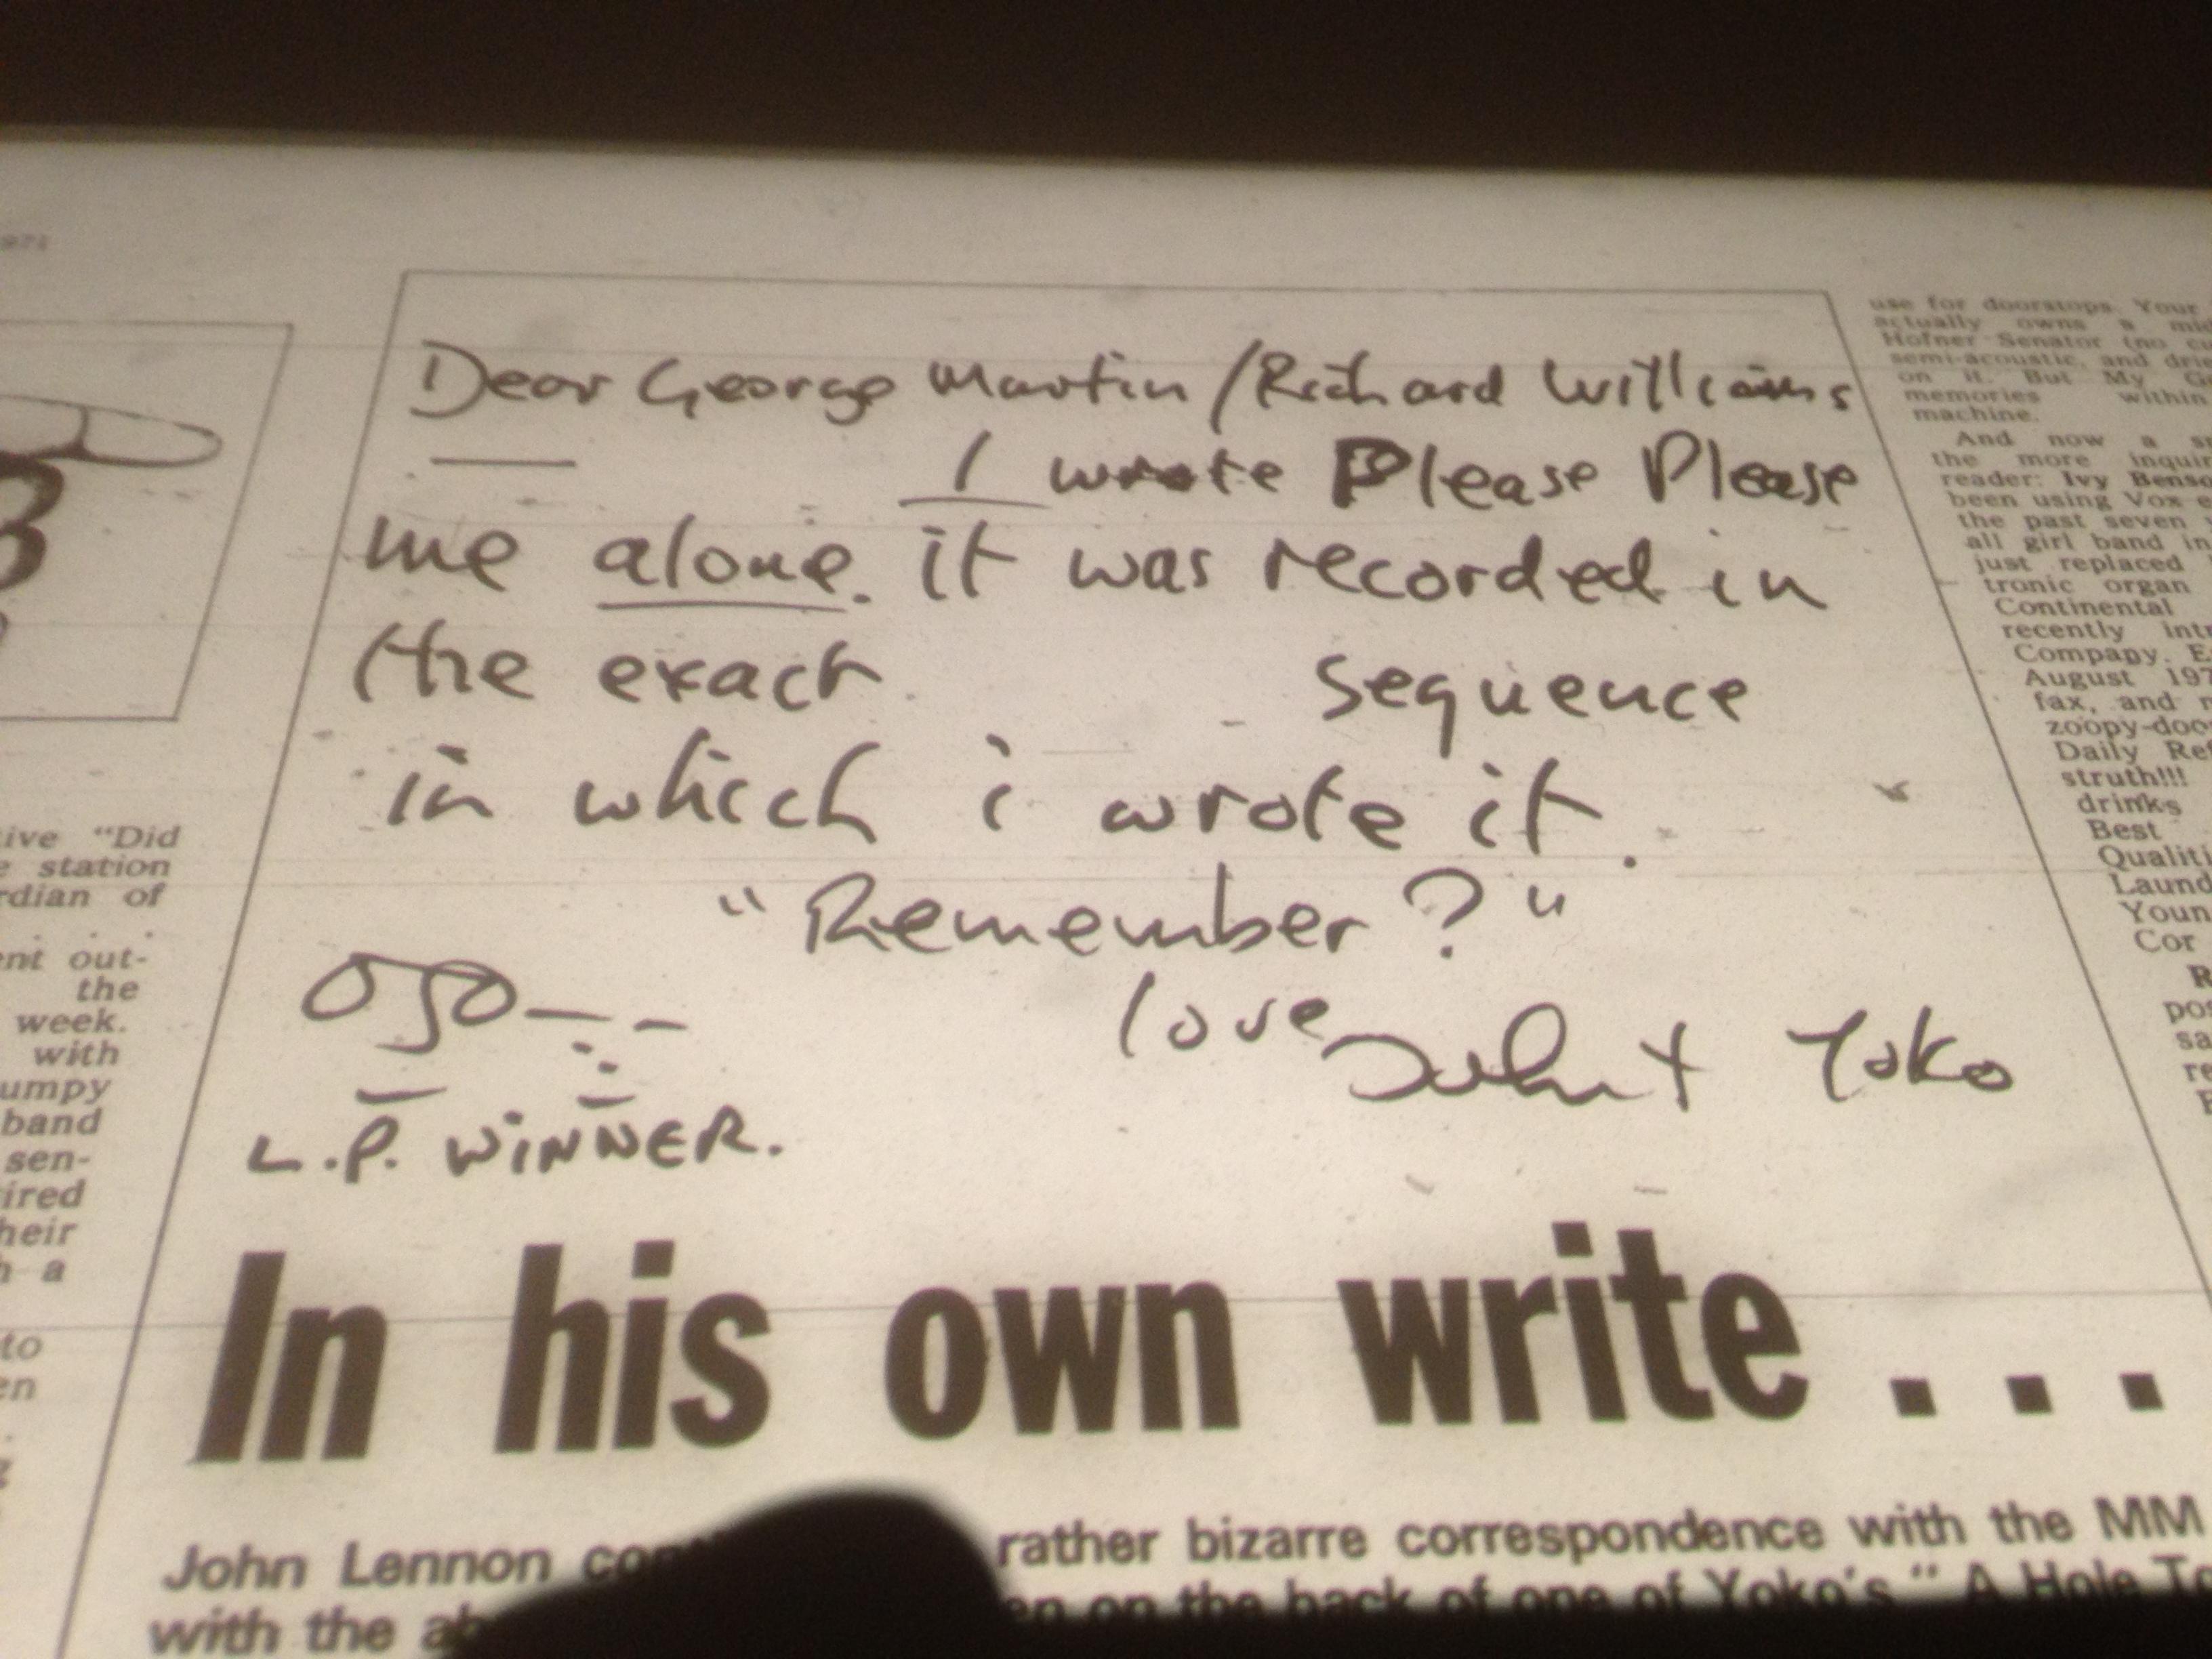 George Martin